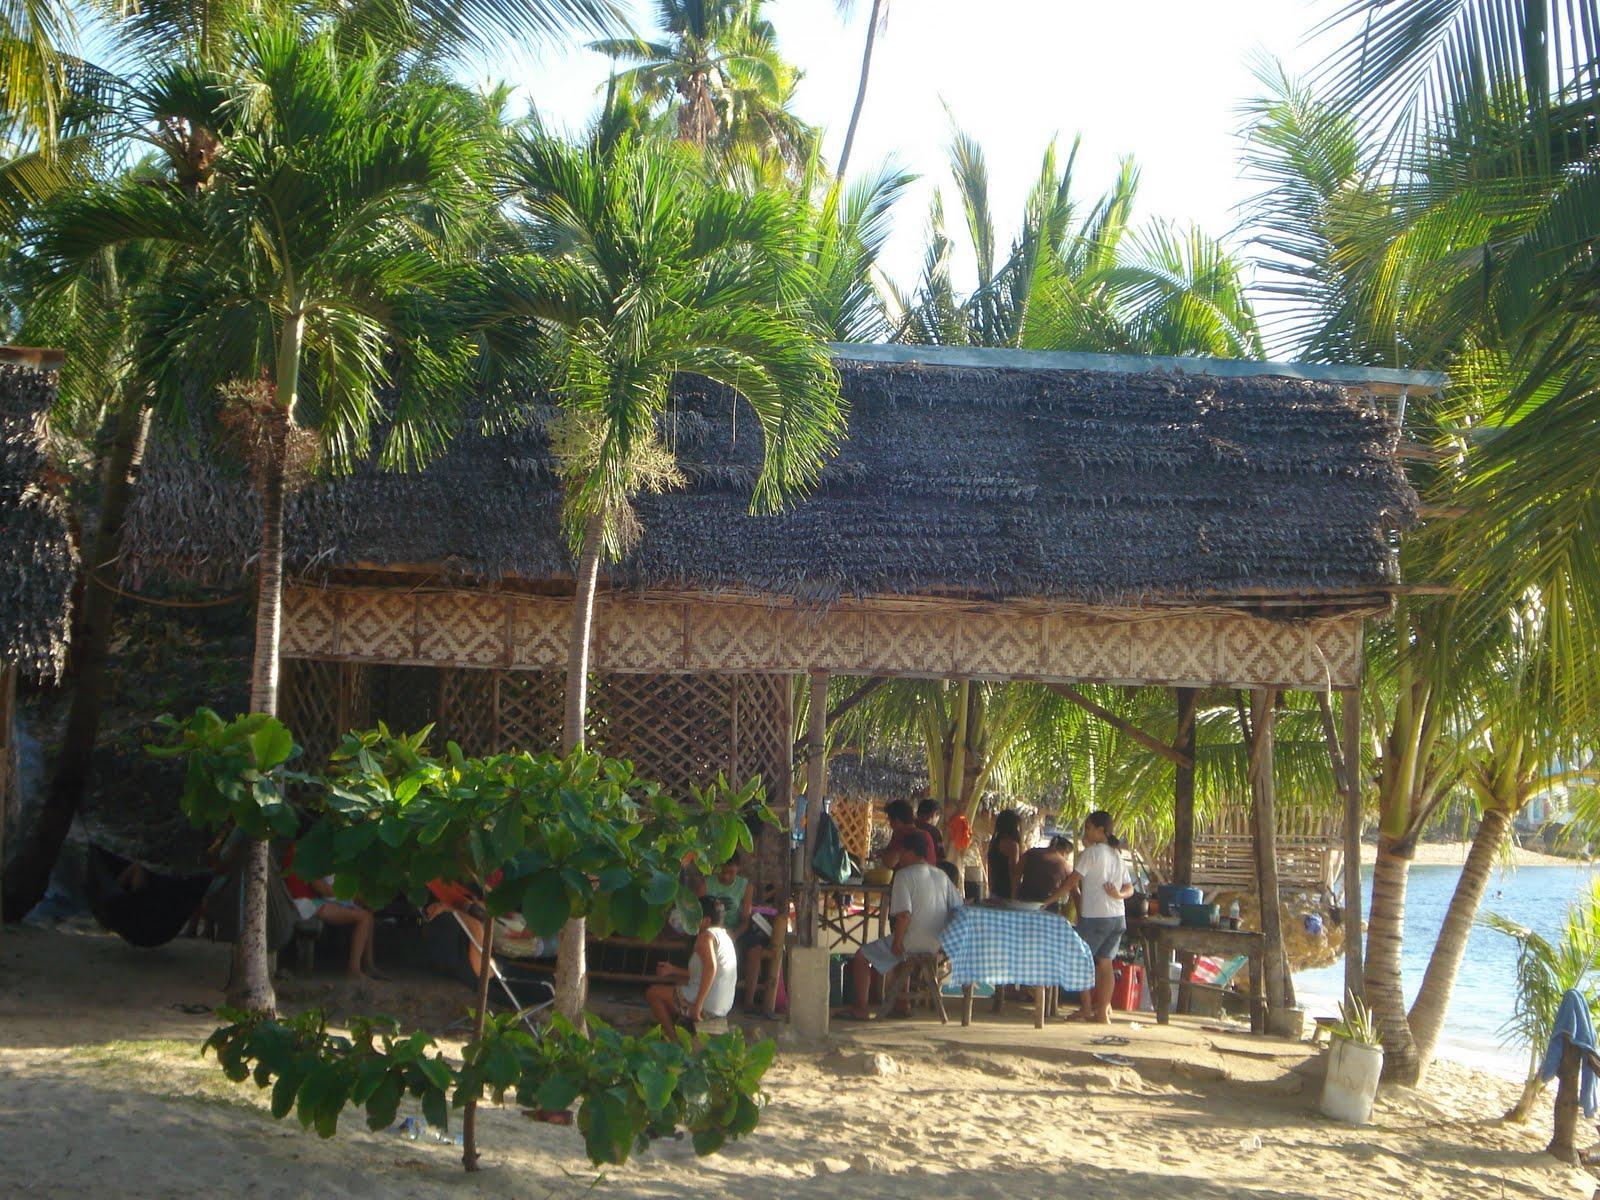 Alcoy (Cebu) Philippines  city photos : My Weekend Journal: Tingko Beach, Alcoy, Cebu, Philippines